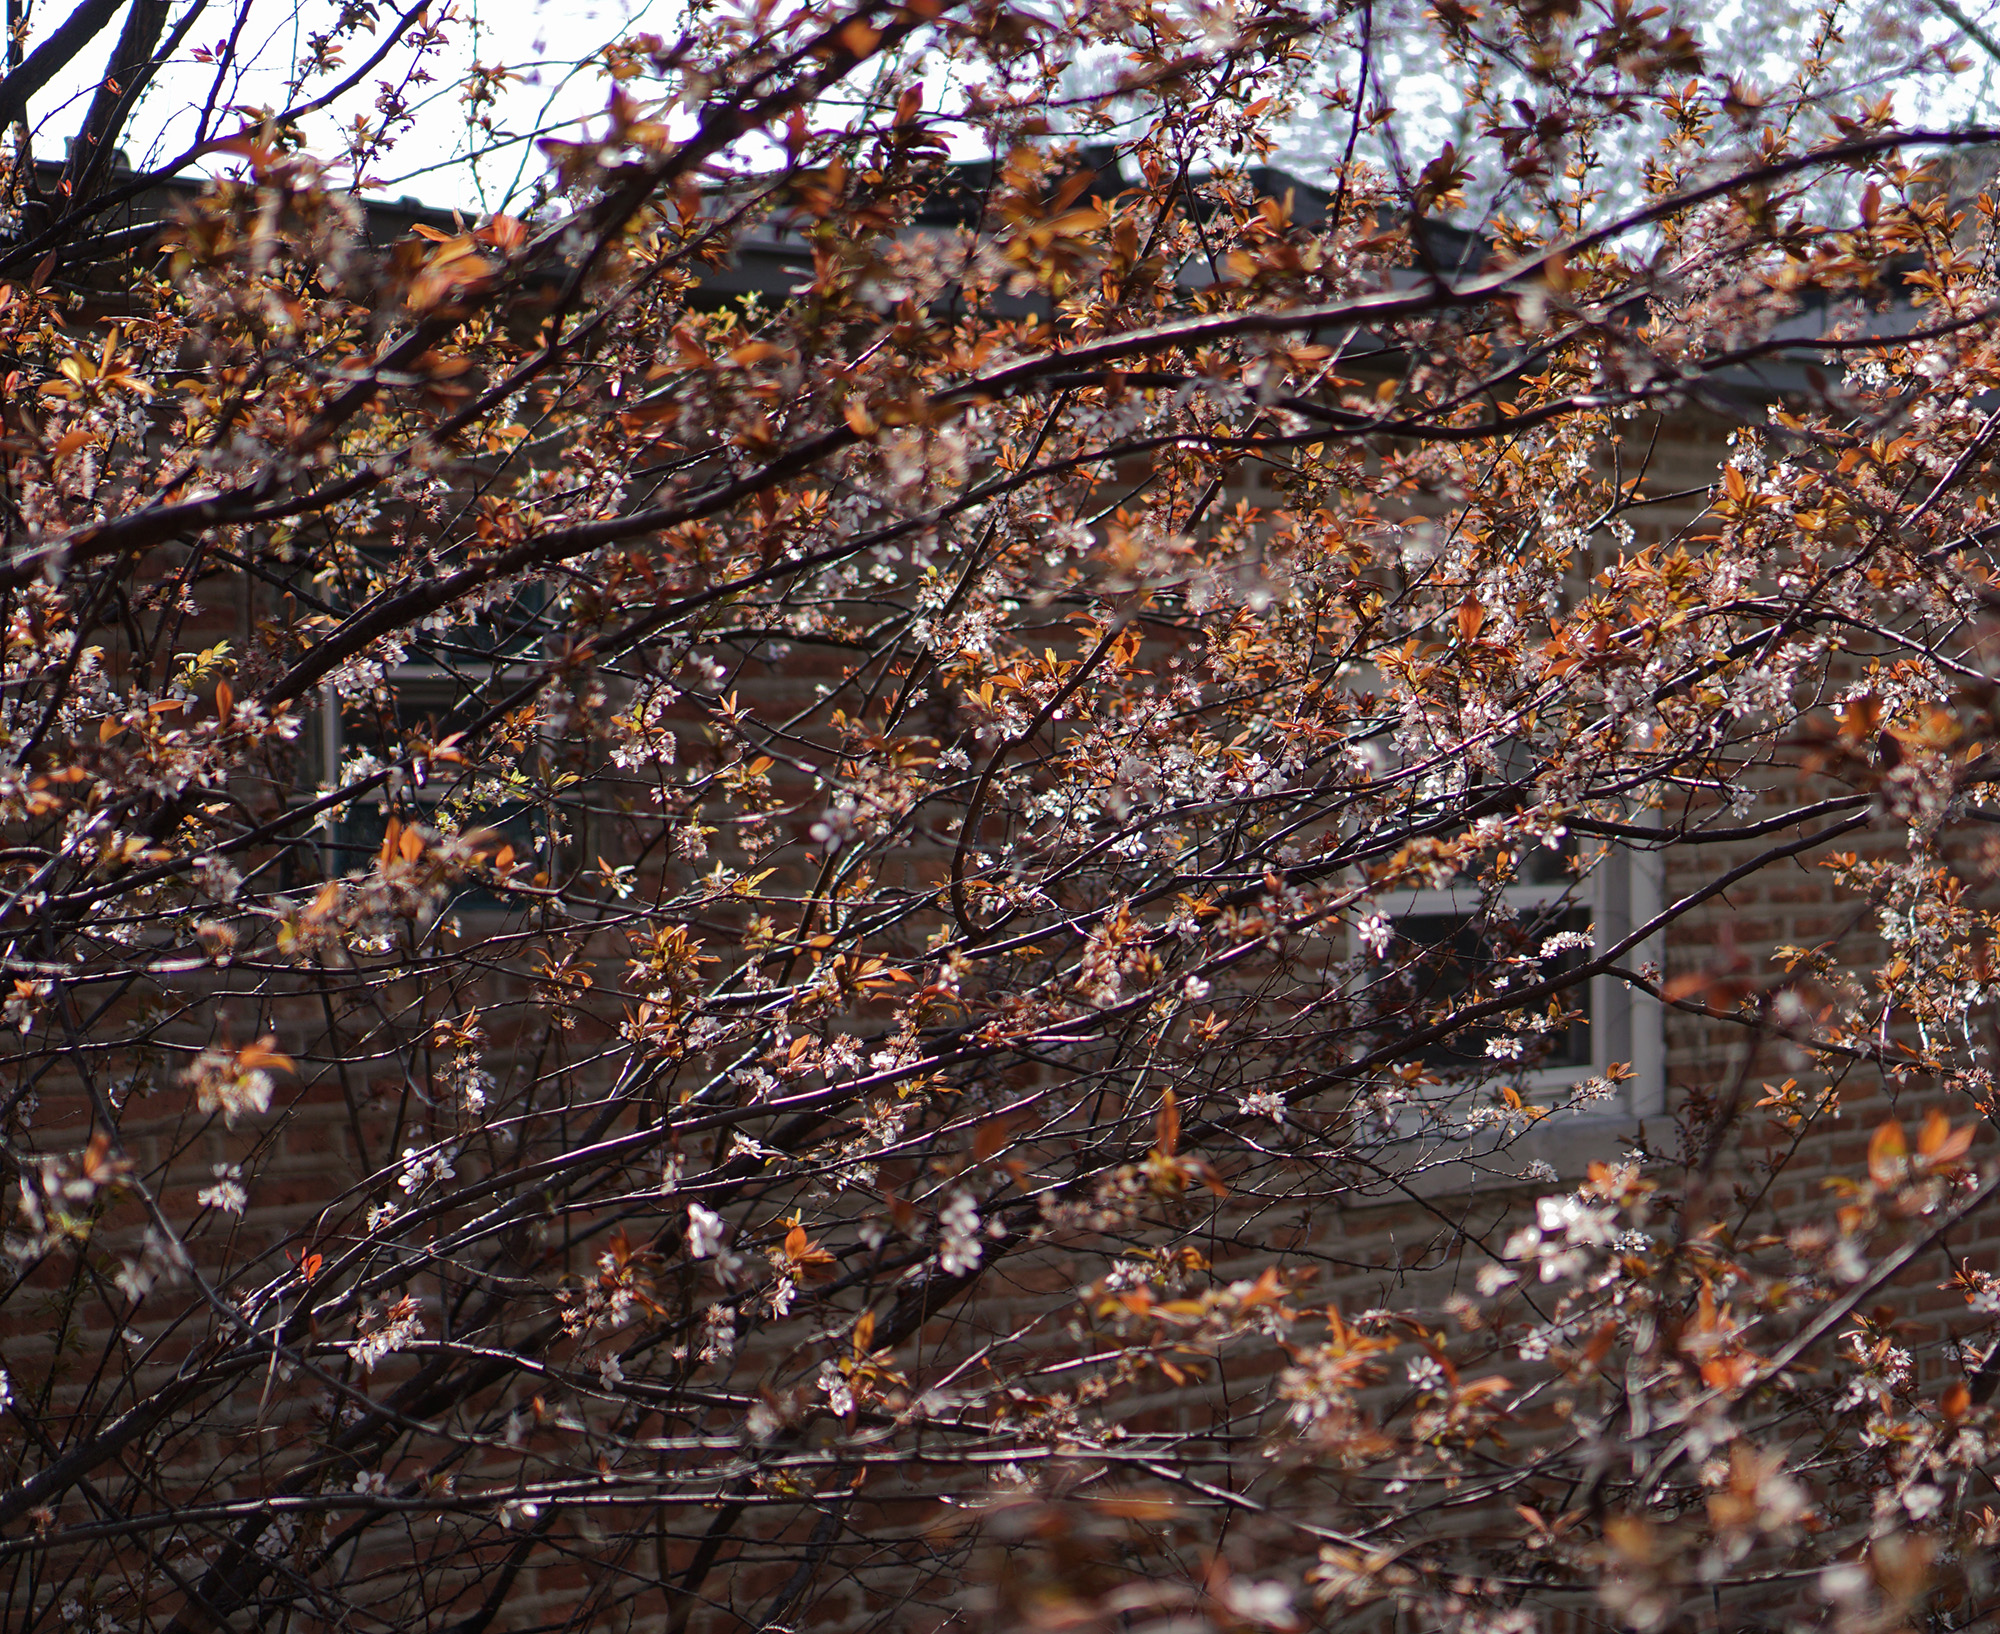 Purpleleaf Plum tree (Prunus cerasifera) with new leaves in spring, Chicago IL / Darker than Green